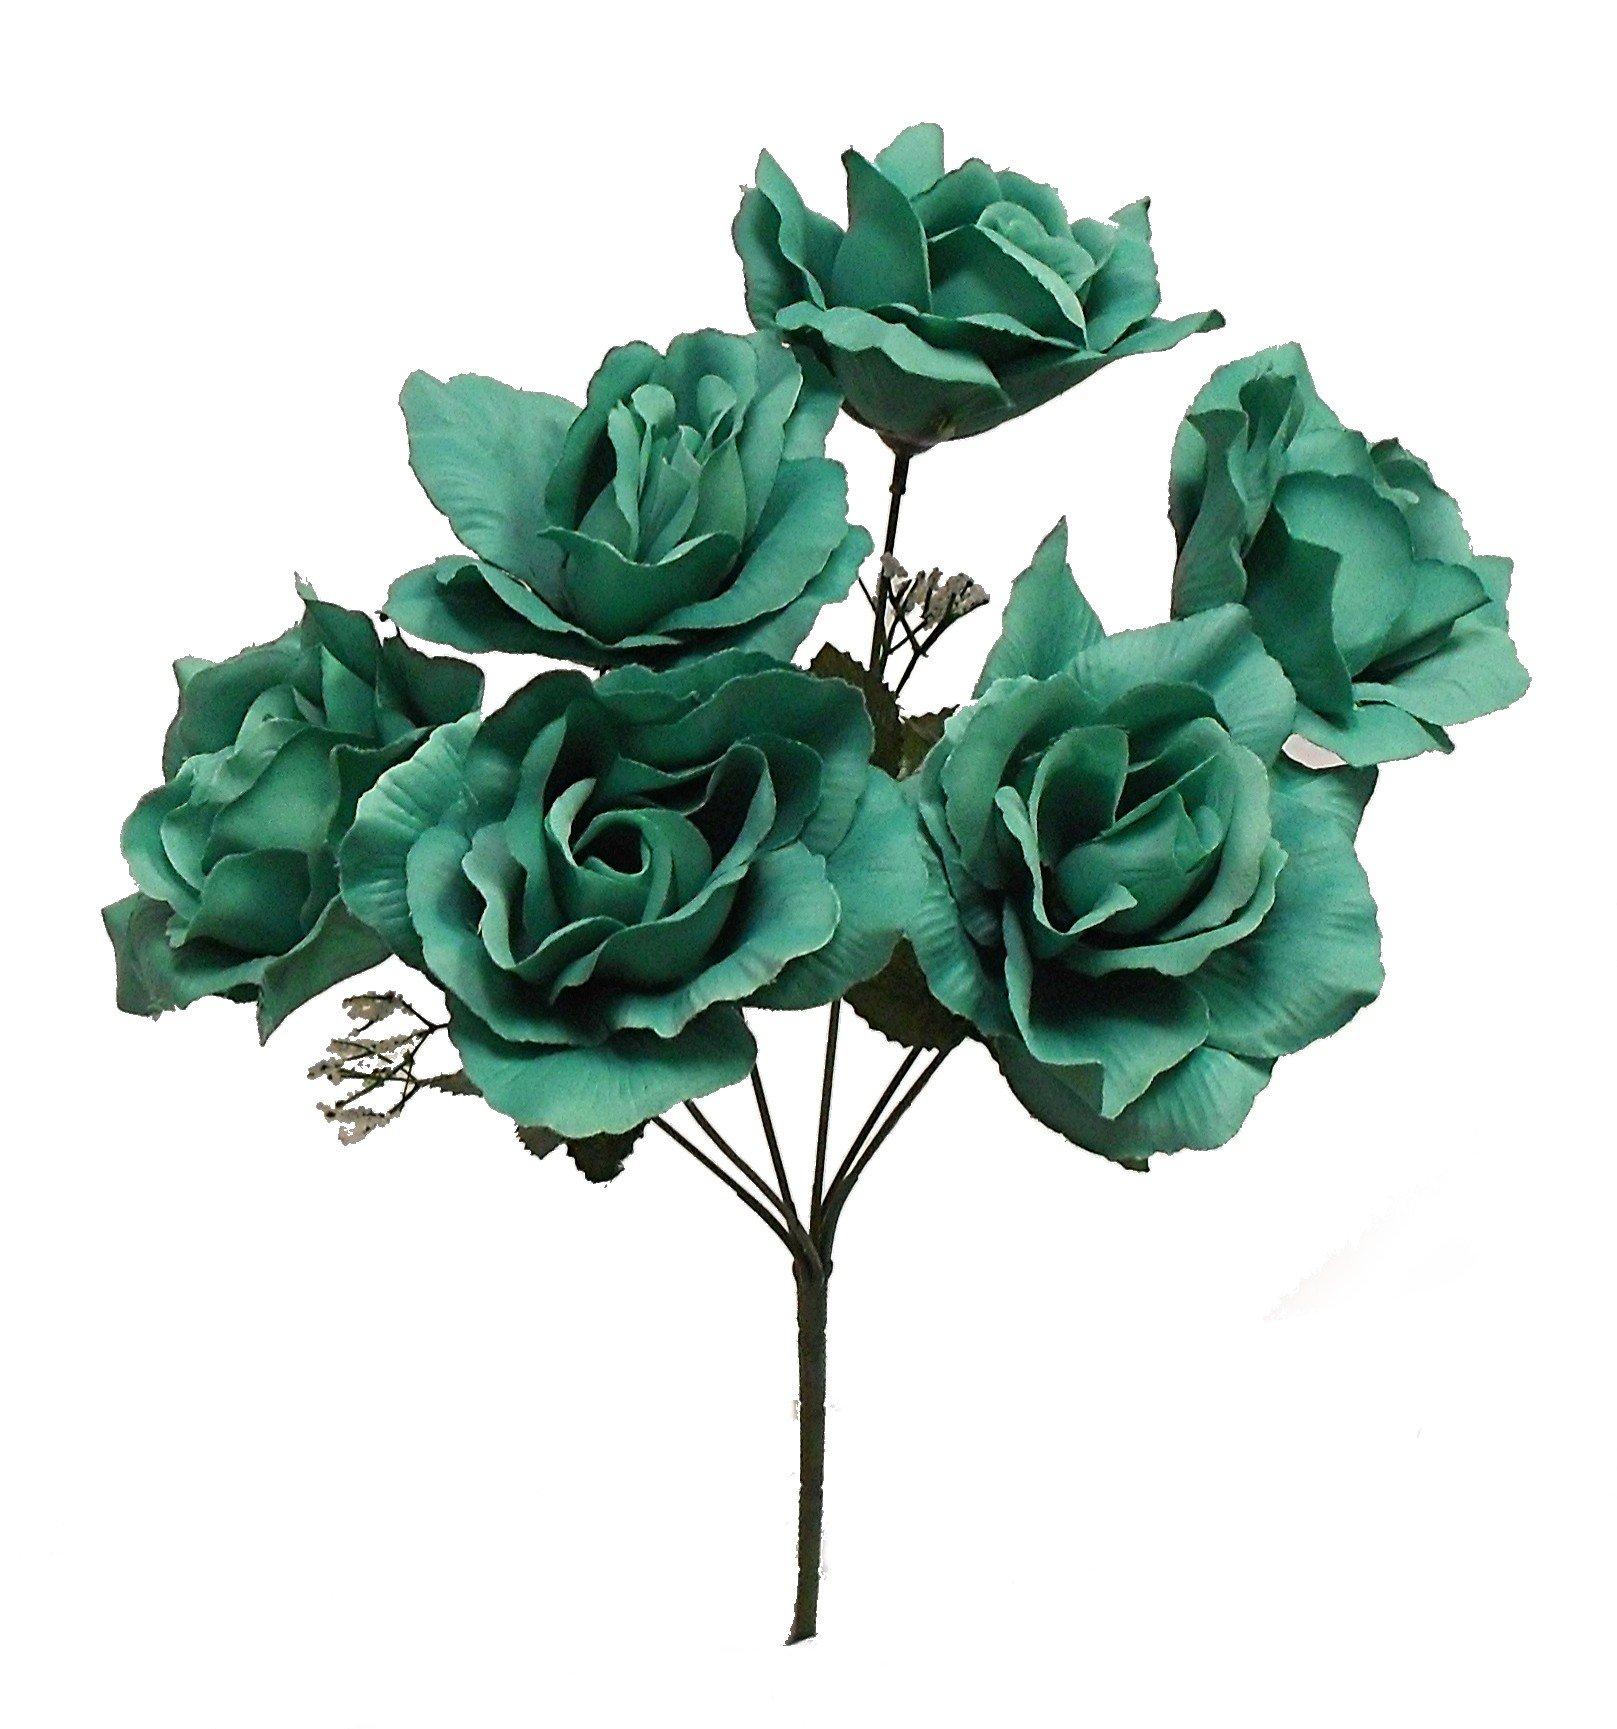 17-Soft-Touch-Micropeach-Open-Rose-Bush-Artificial-Silk-Wedding-Craft-Flowers-Home-Decor-6-Heads